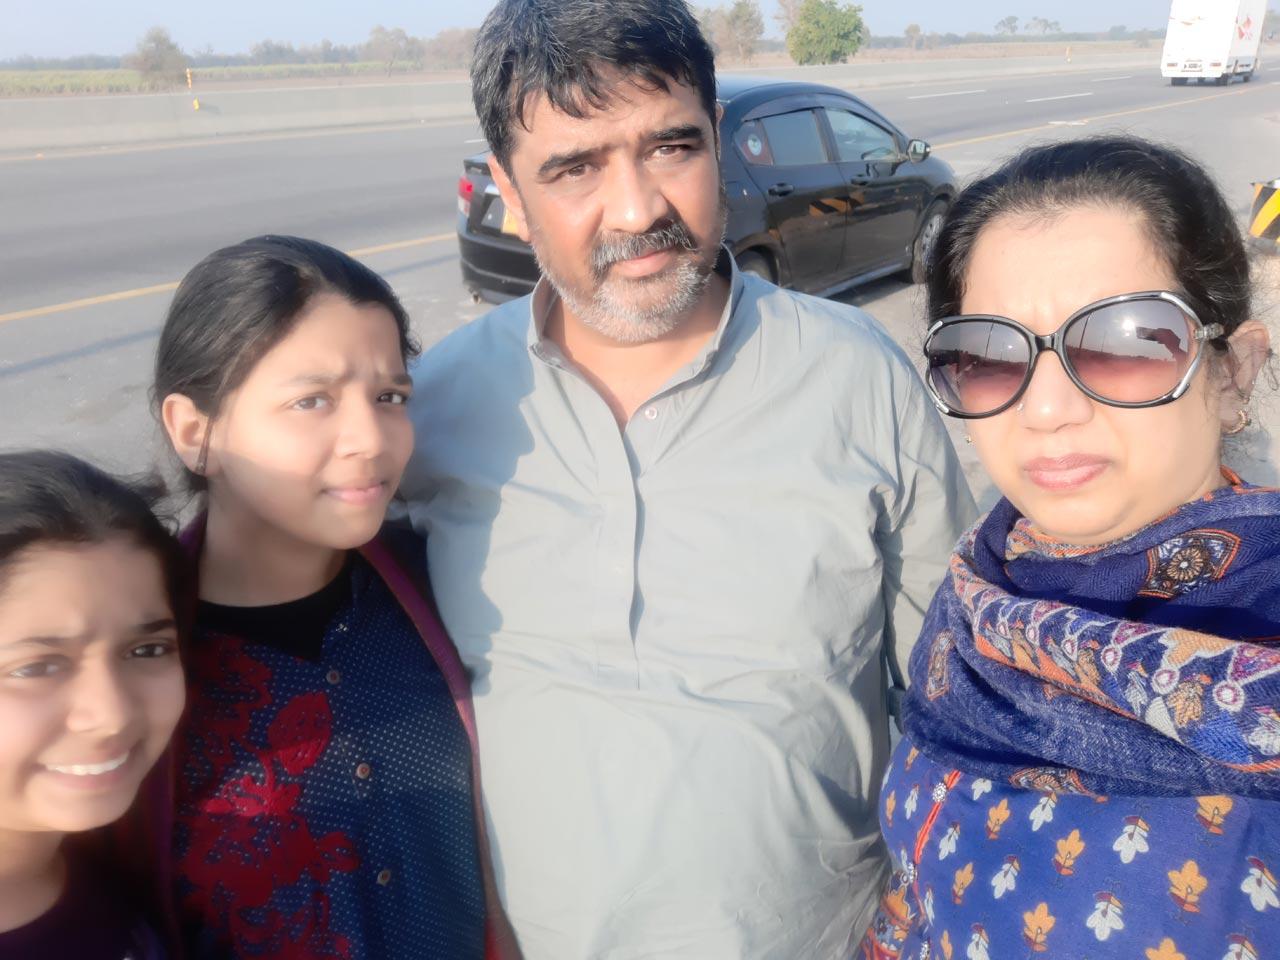 Zoya Imran, Zara Imran, Imran Khan and Erum Imran.